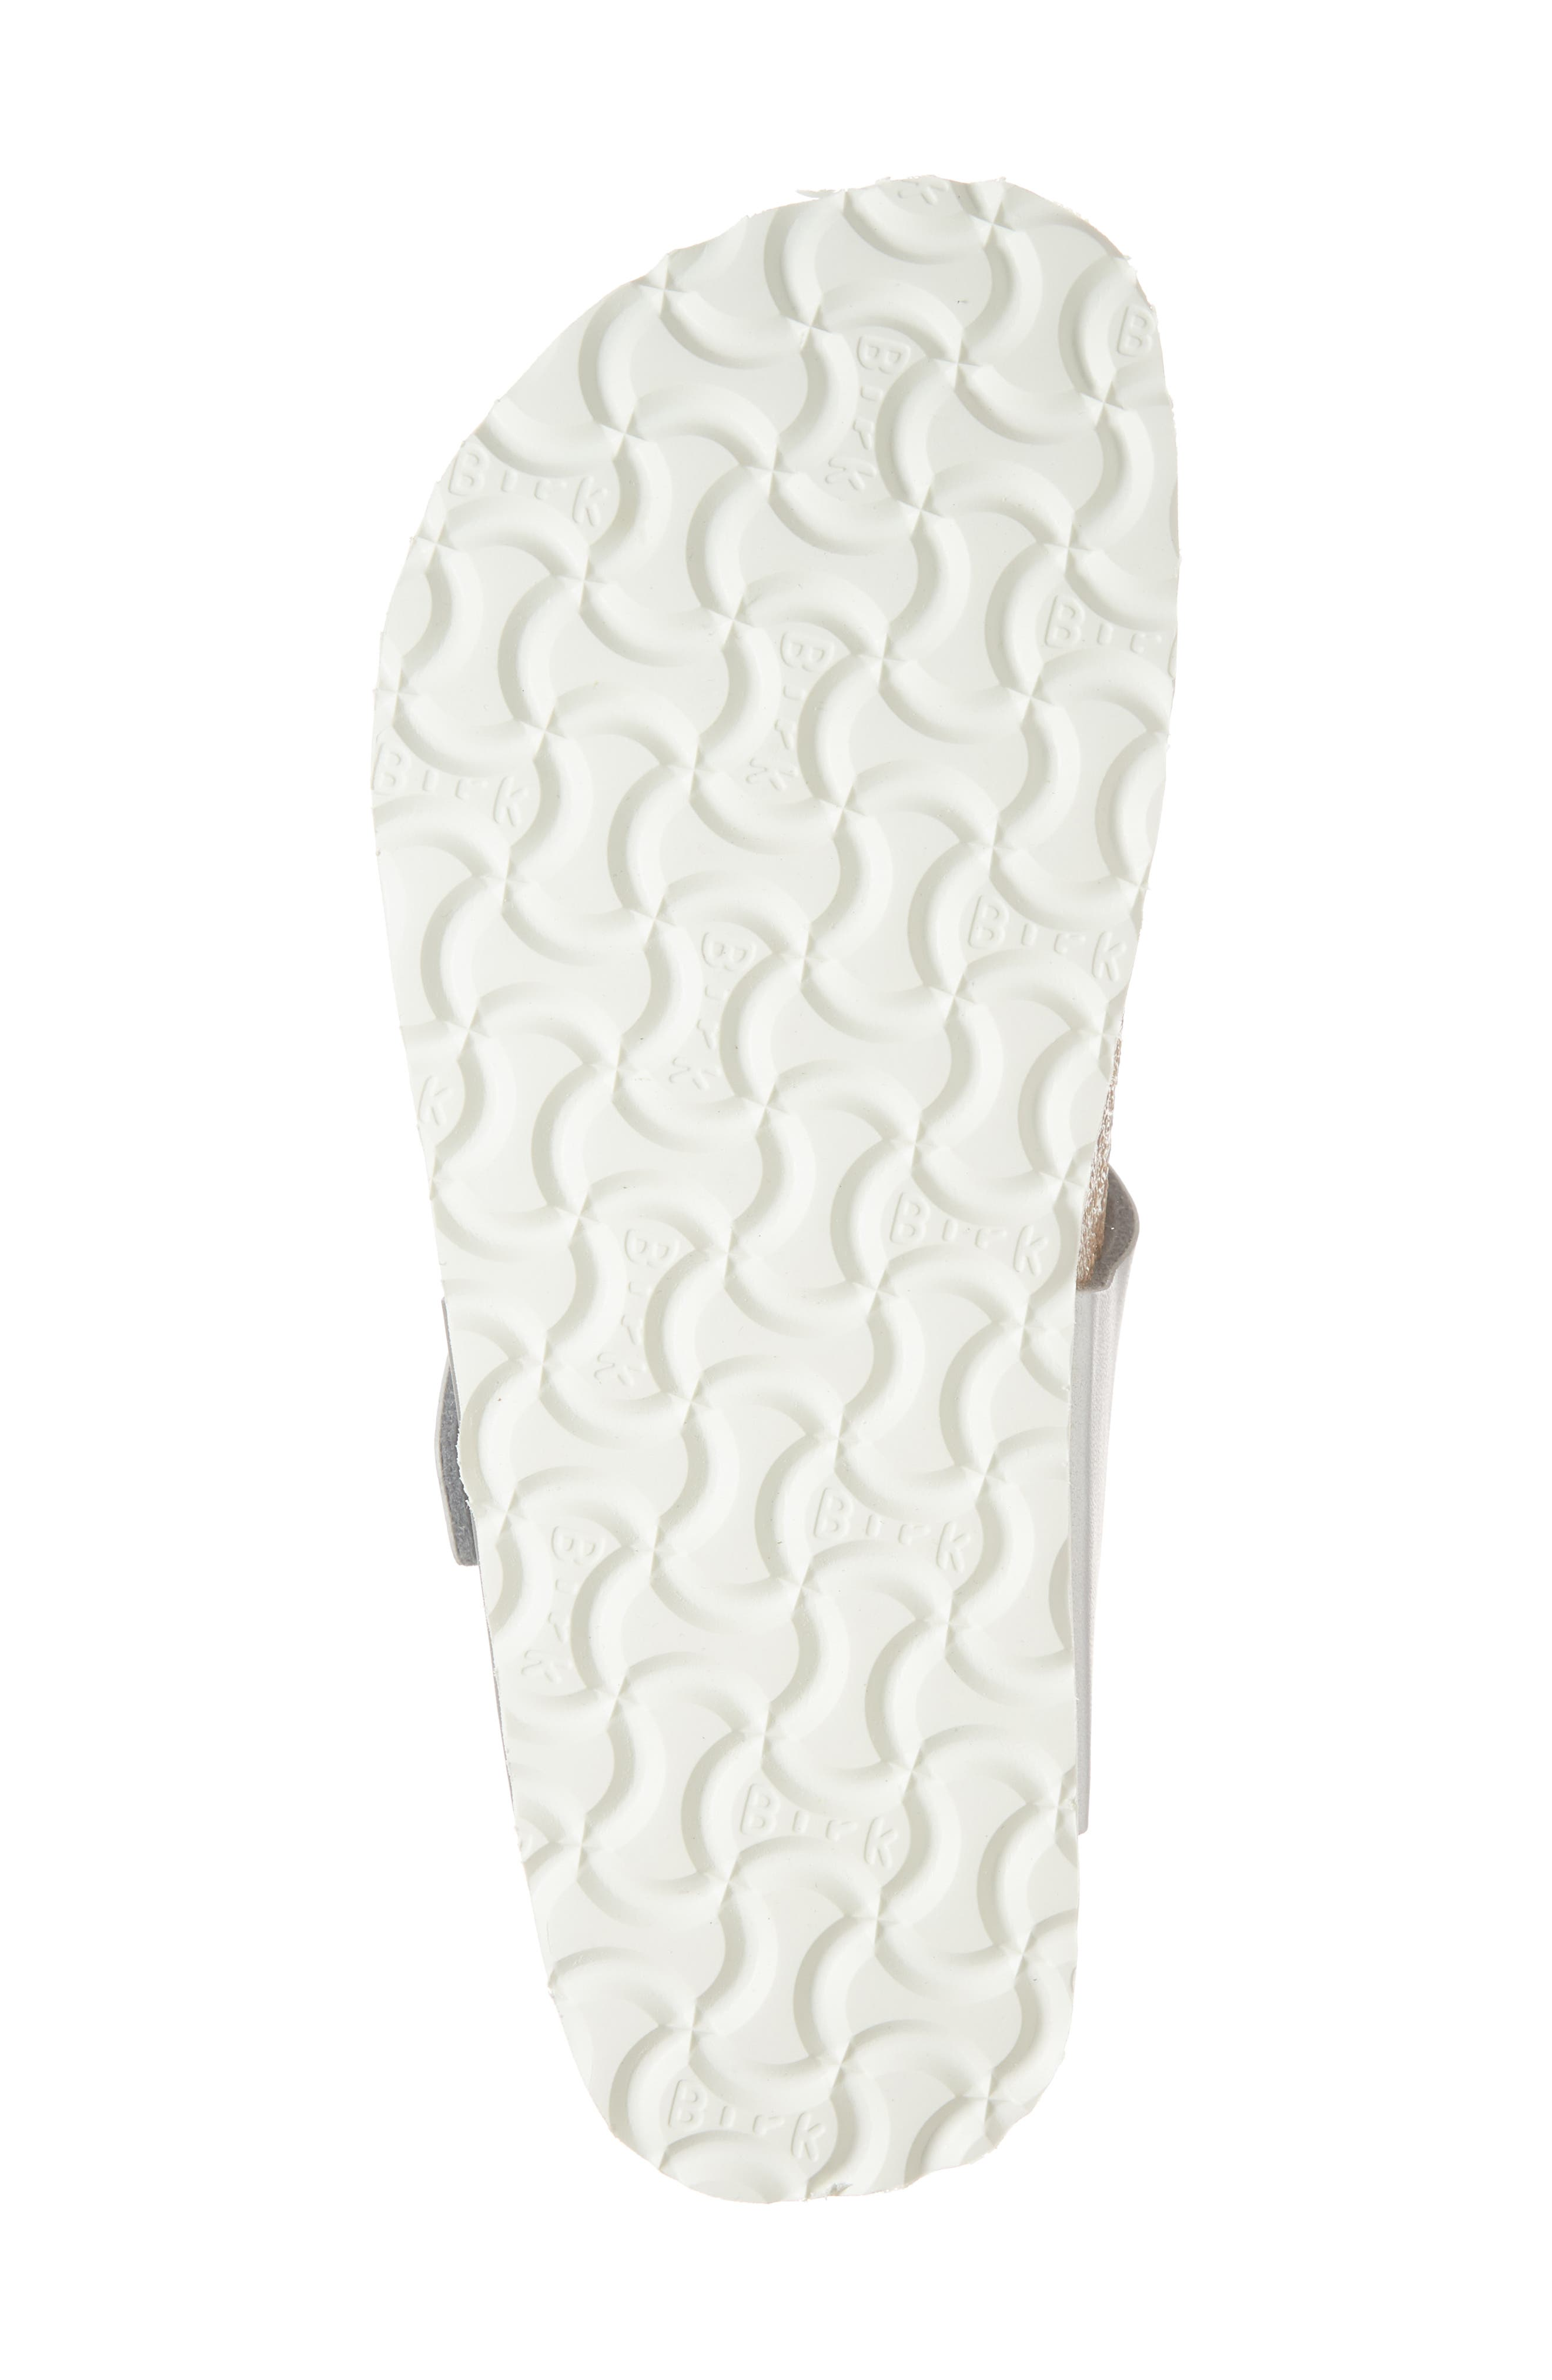 Papillio by Birkenstock 'Gizeh' Birko-Flor Platform Flip Flop Sandal,                             Alternate thumbnail 6, color,                             150